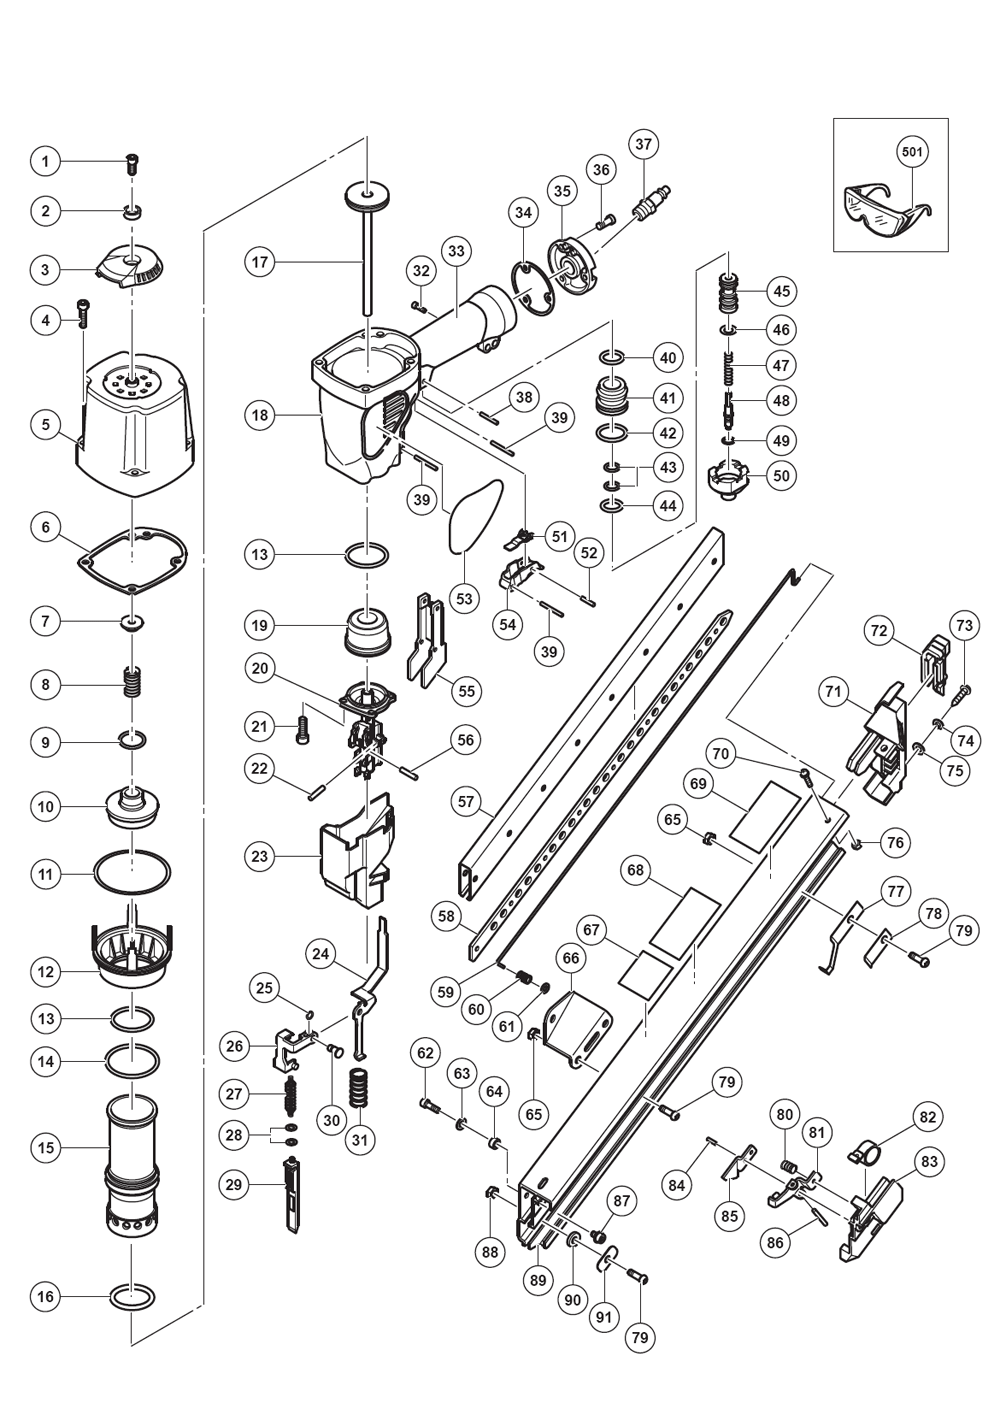 Buy Hitachi NR65AK2(S) 2-1/2 Inch Strap-Tite Fastening